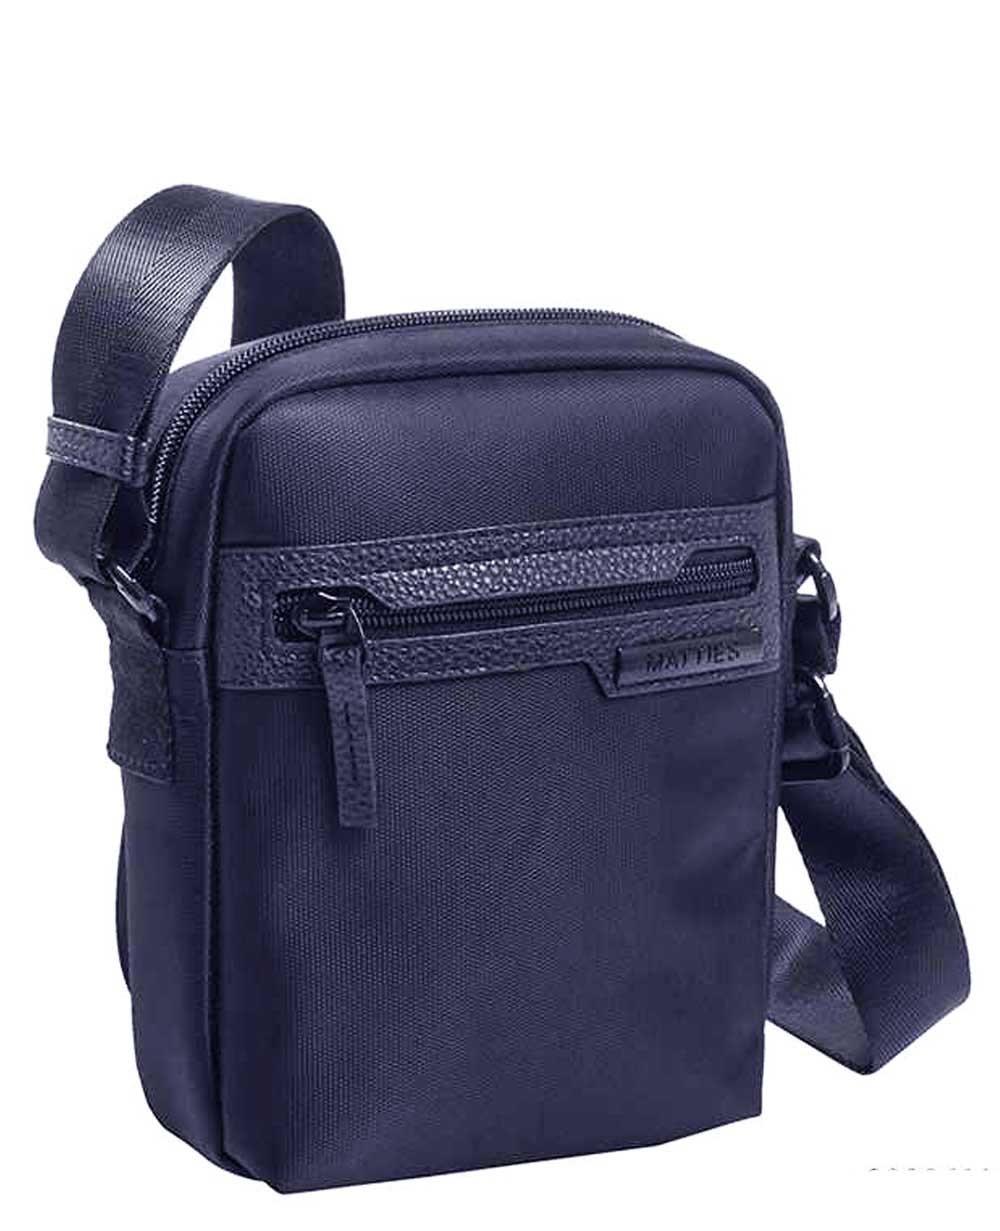 Matties Bags Bandolera Lona Azul (Foto )